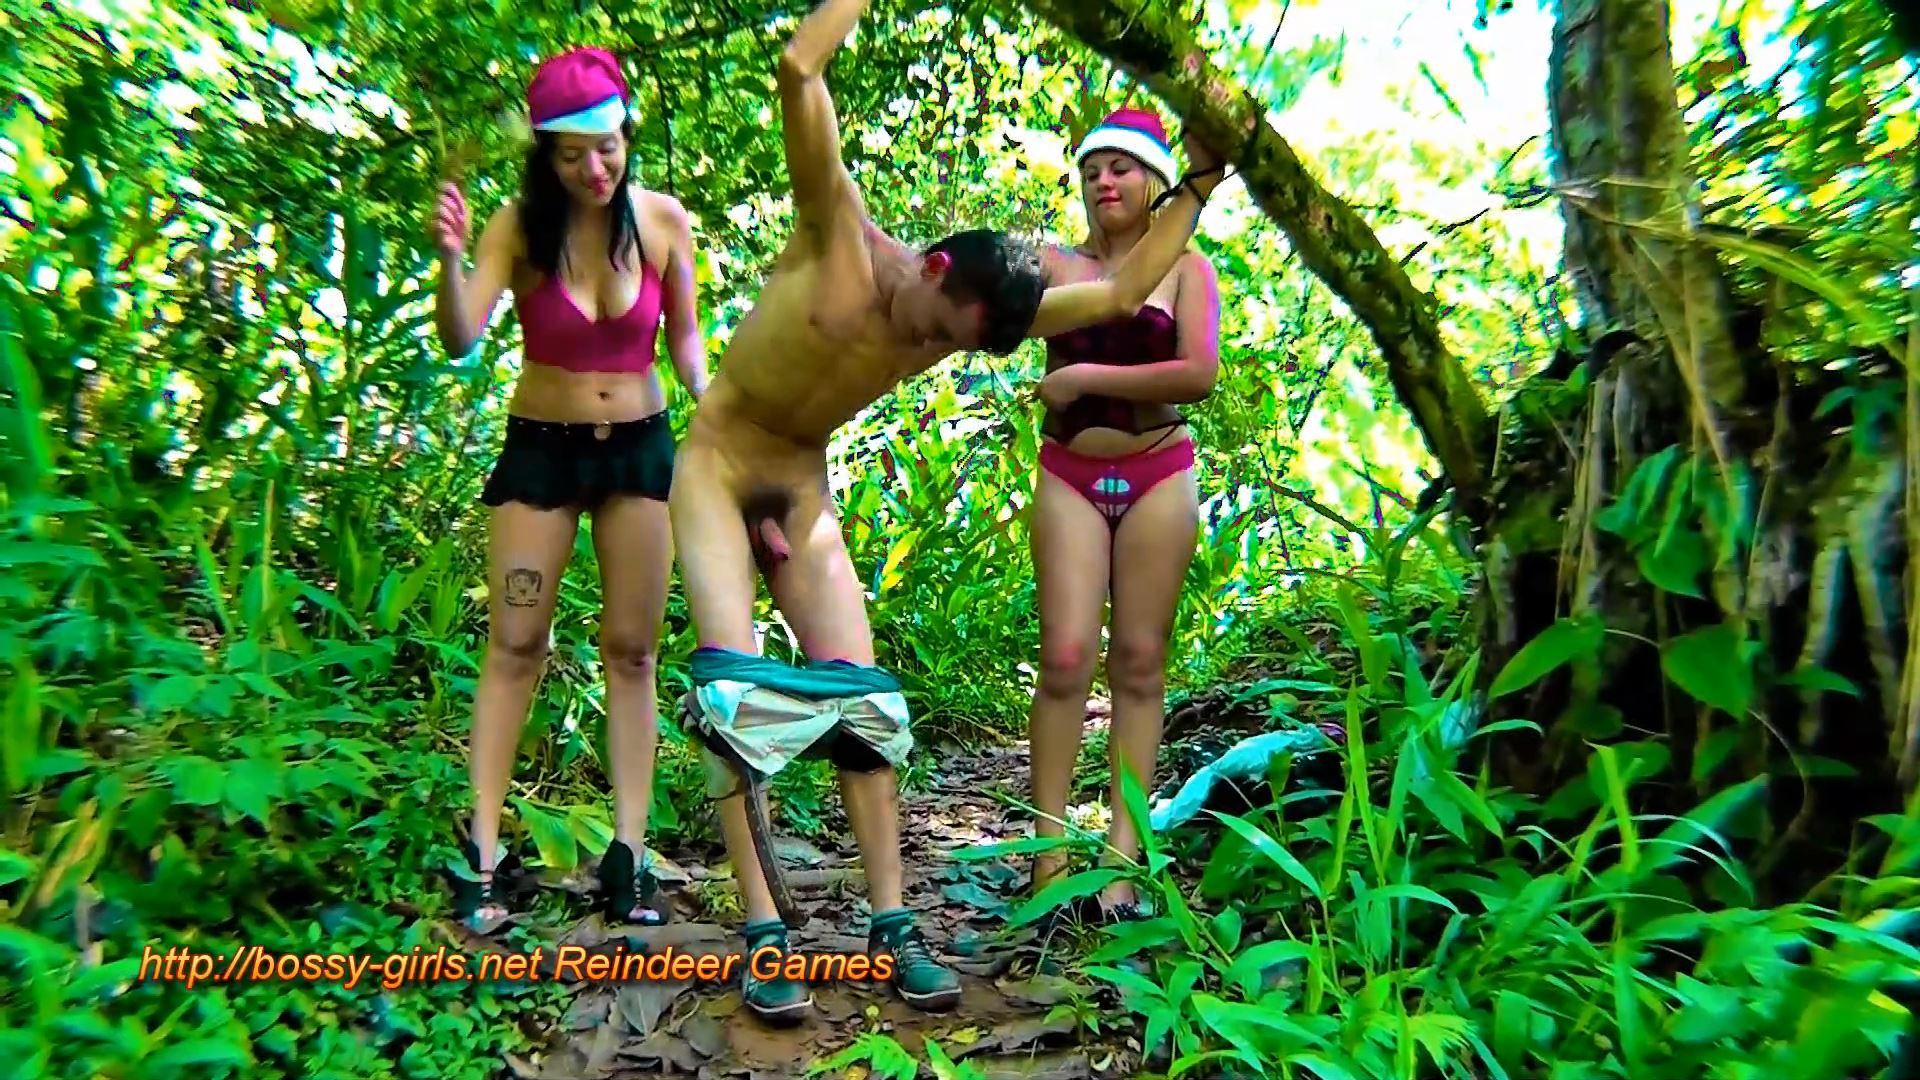 Jane Guerrero, Mlada, Worthless Scum In Scene: REINDEER GAMES 3 Jolly Good Beatings - BOSSY-GIRLS - FULL HD/1080p/MP4